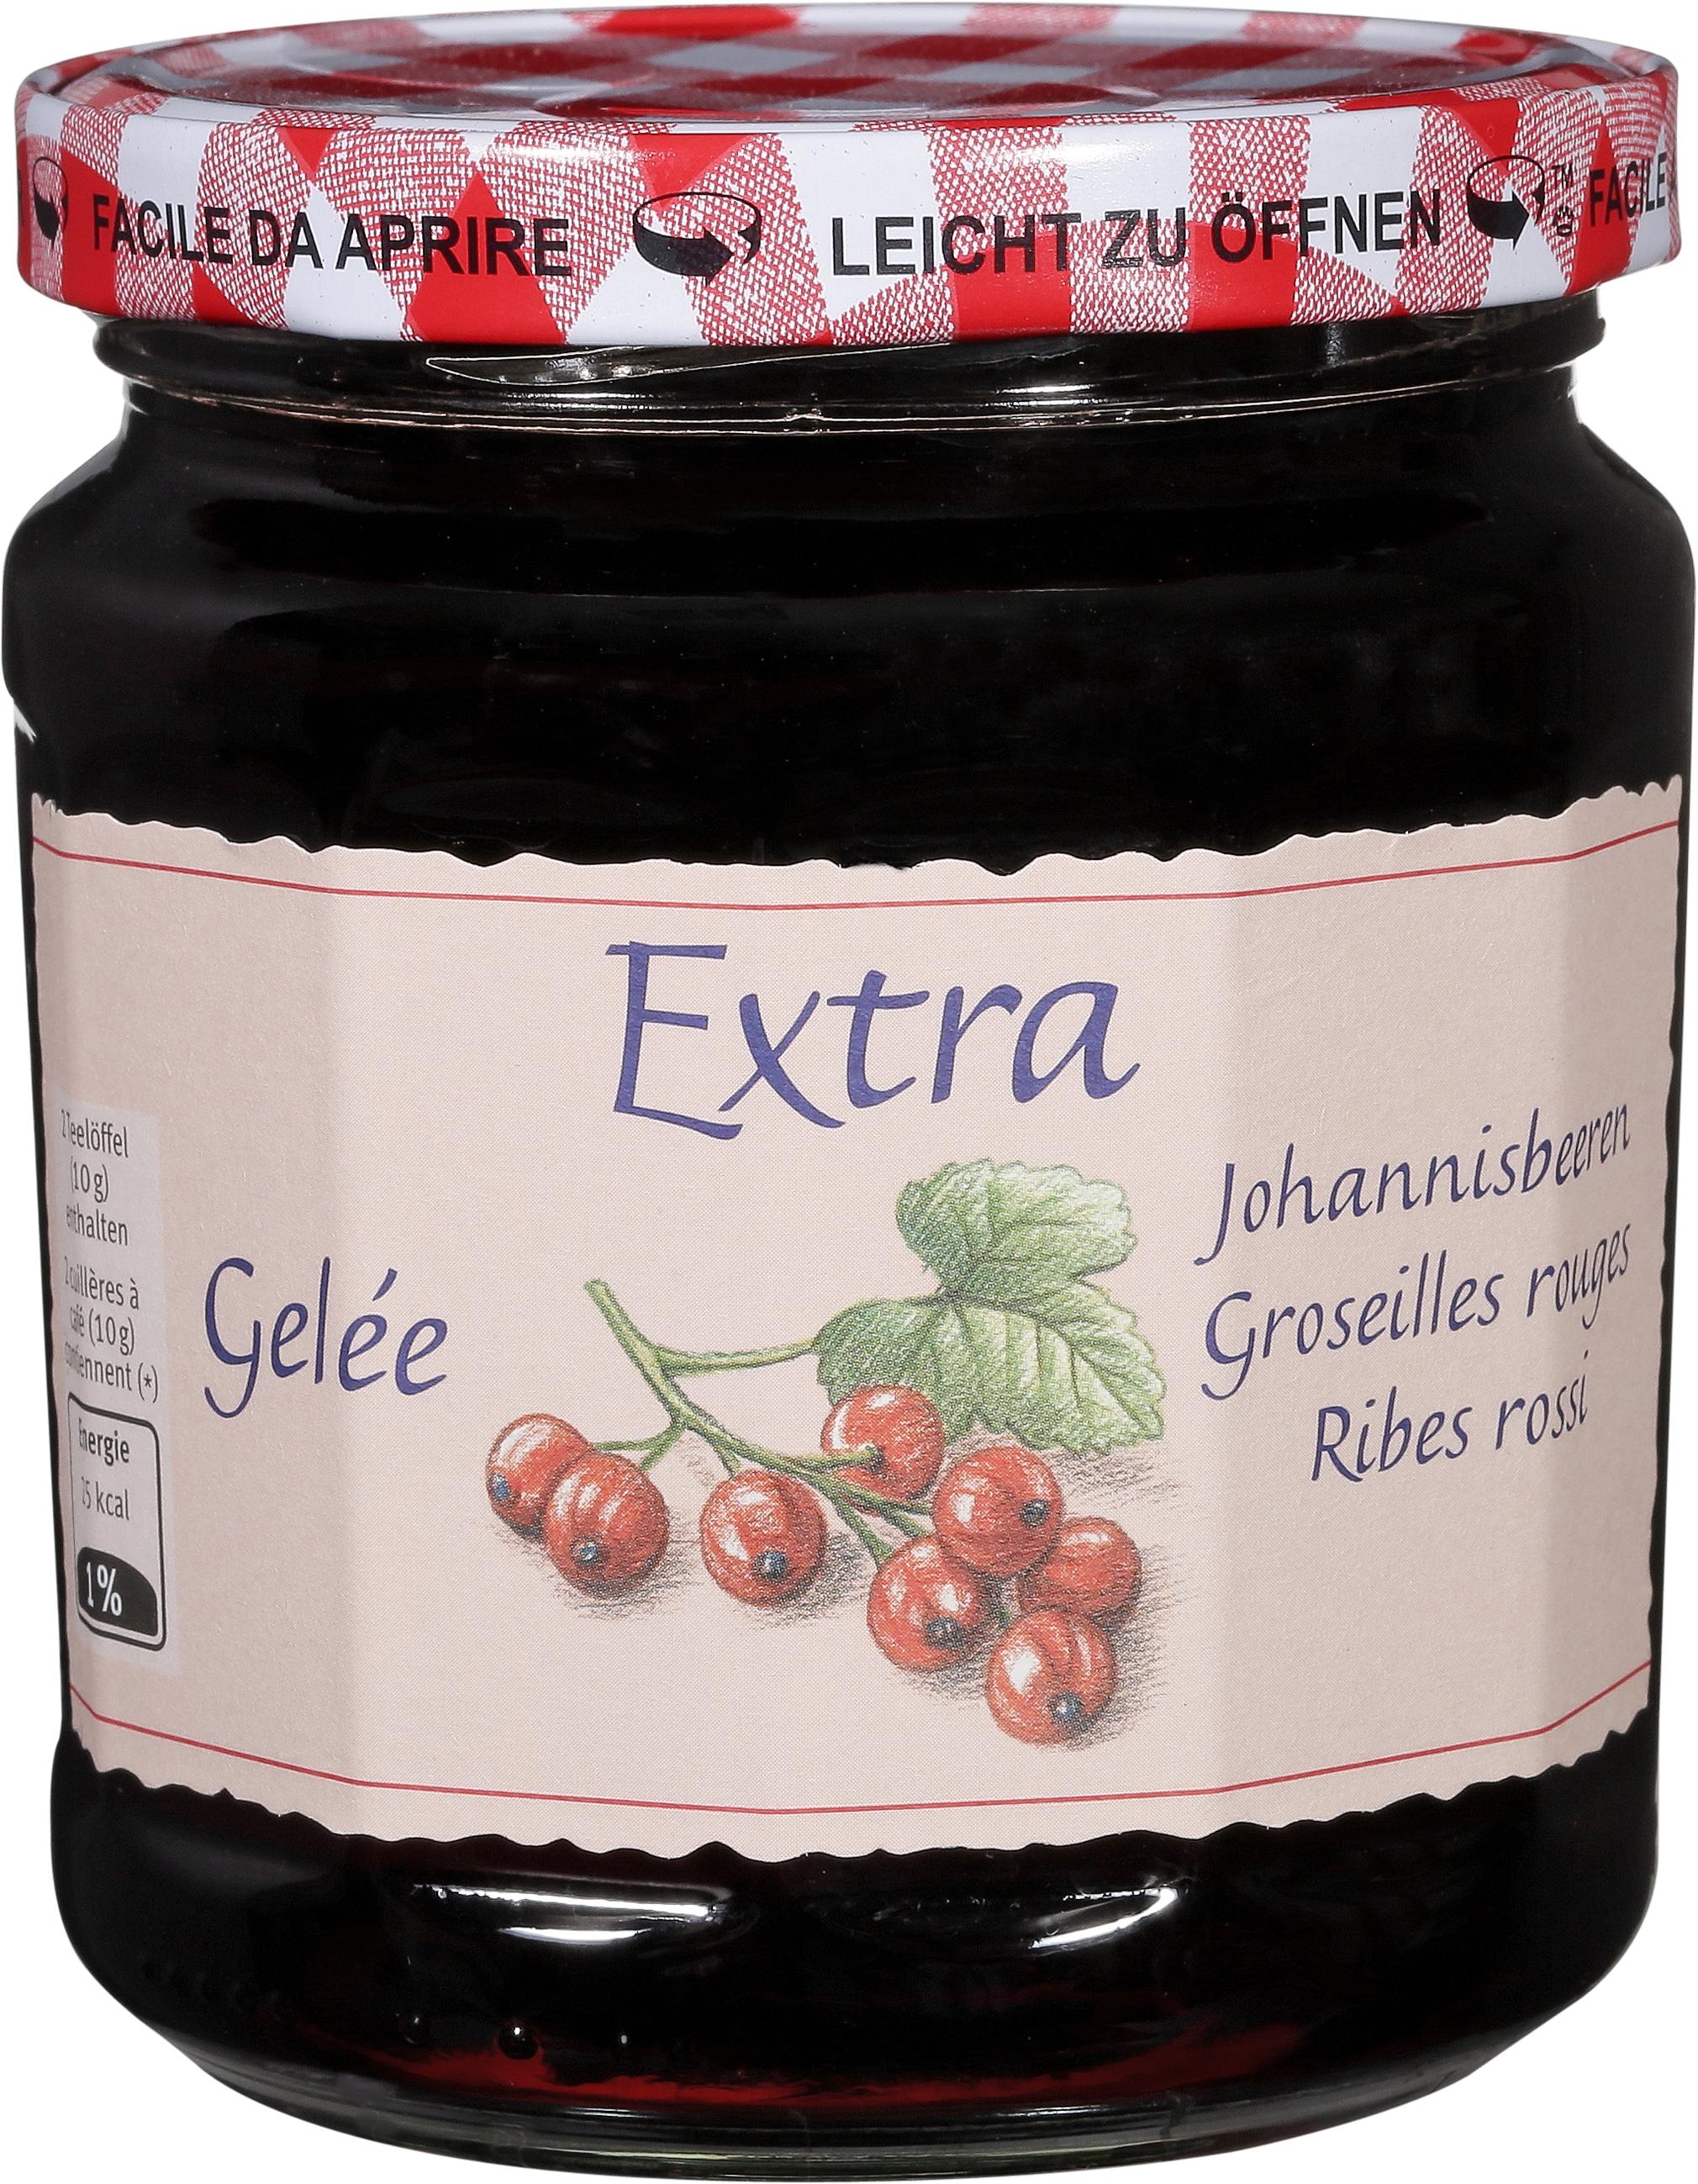 Johannisbeer-Gelée extra - 500g